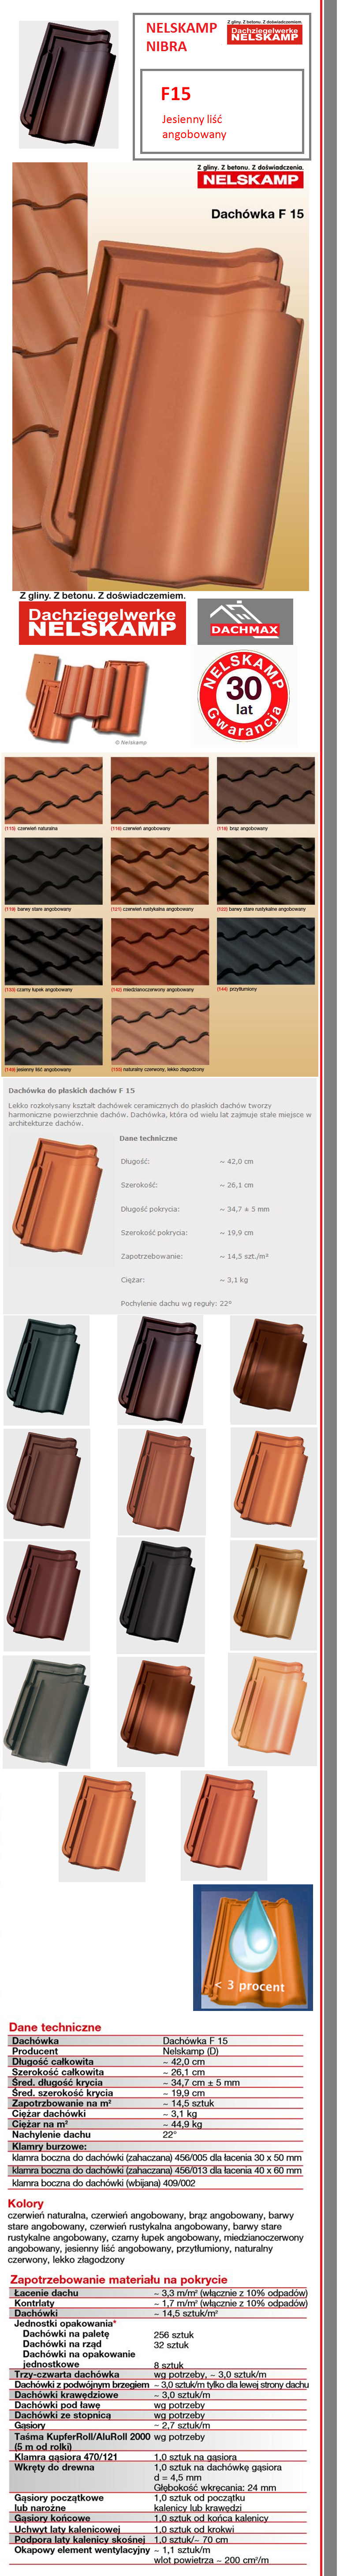 f15 dach wka nelskamp nibra jesienny li angobowany. Black Bedroom Furniture Sets. Home Design Ideas